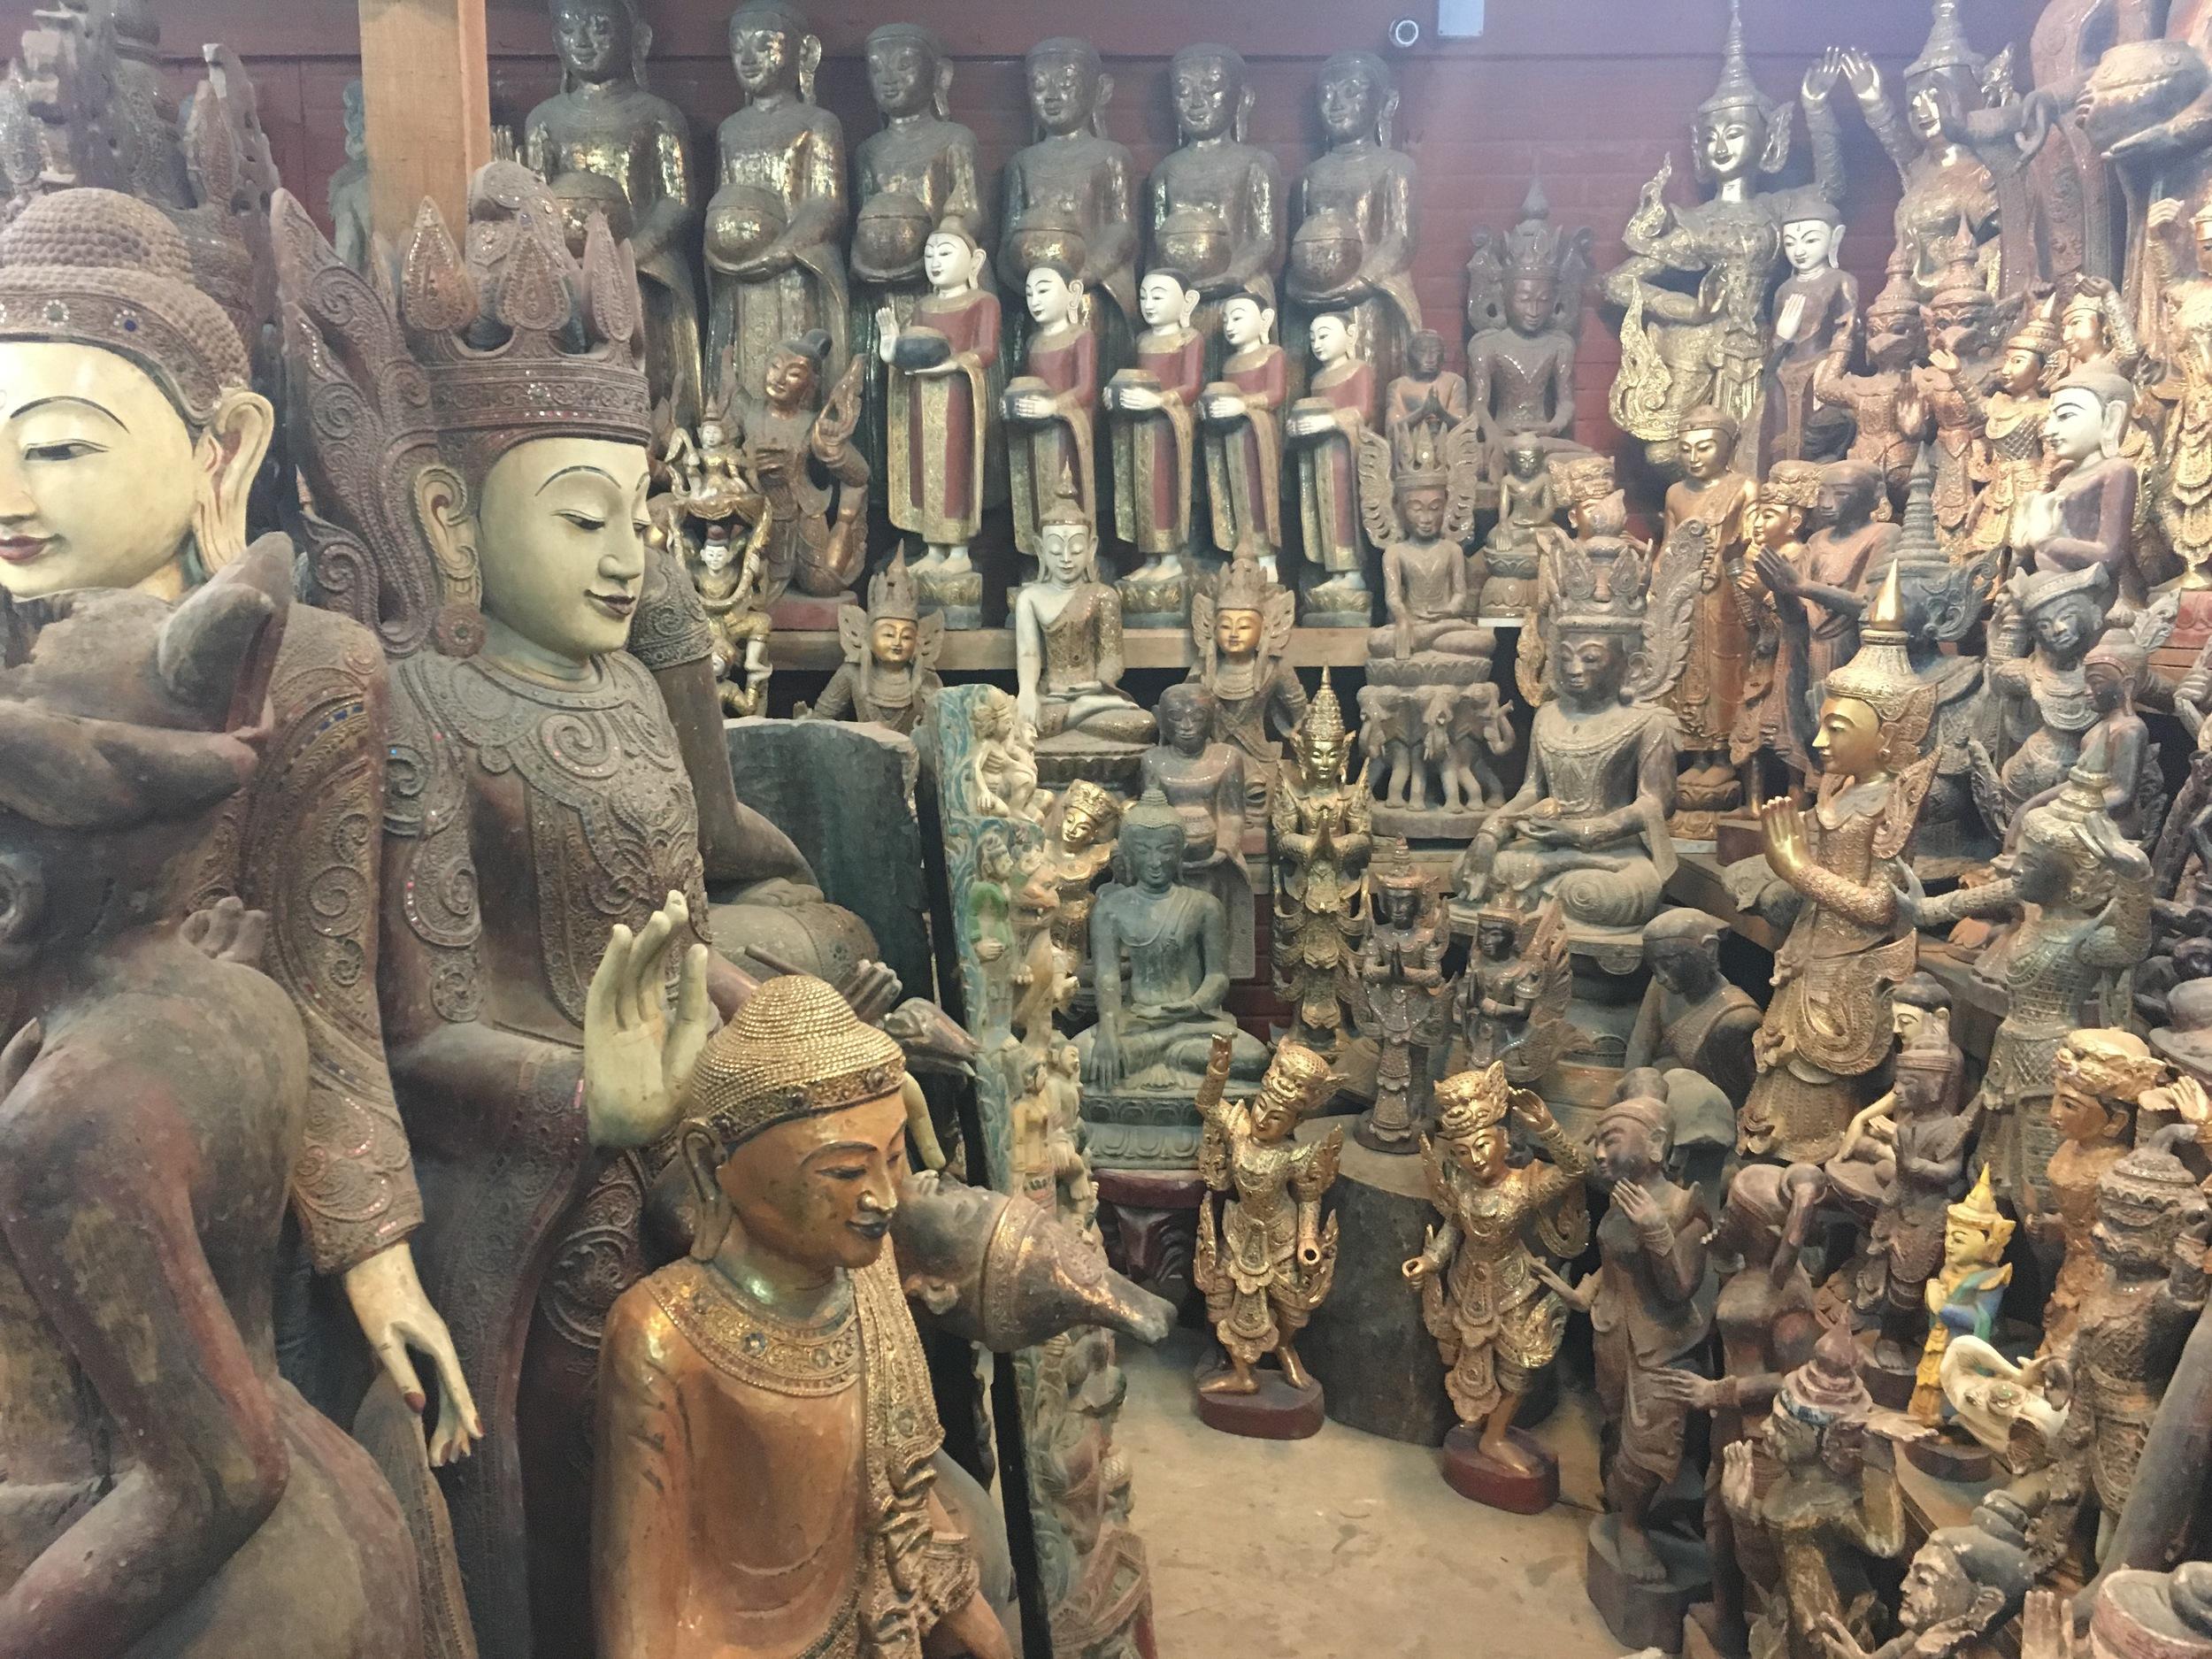 Buddha Buddha Buddha